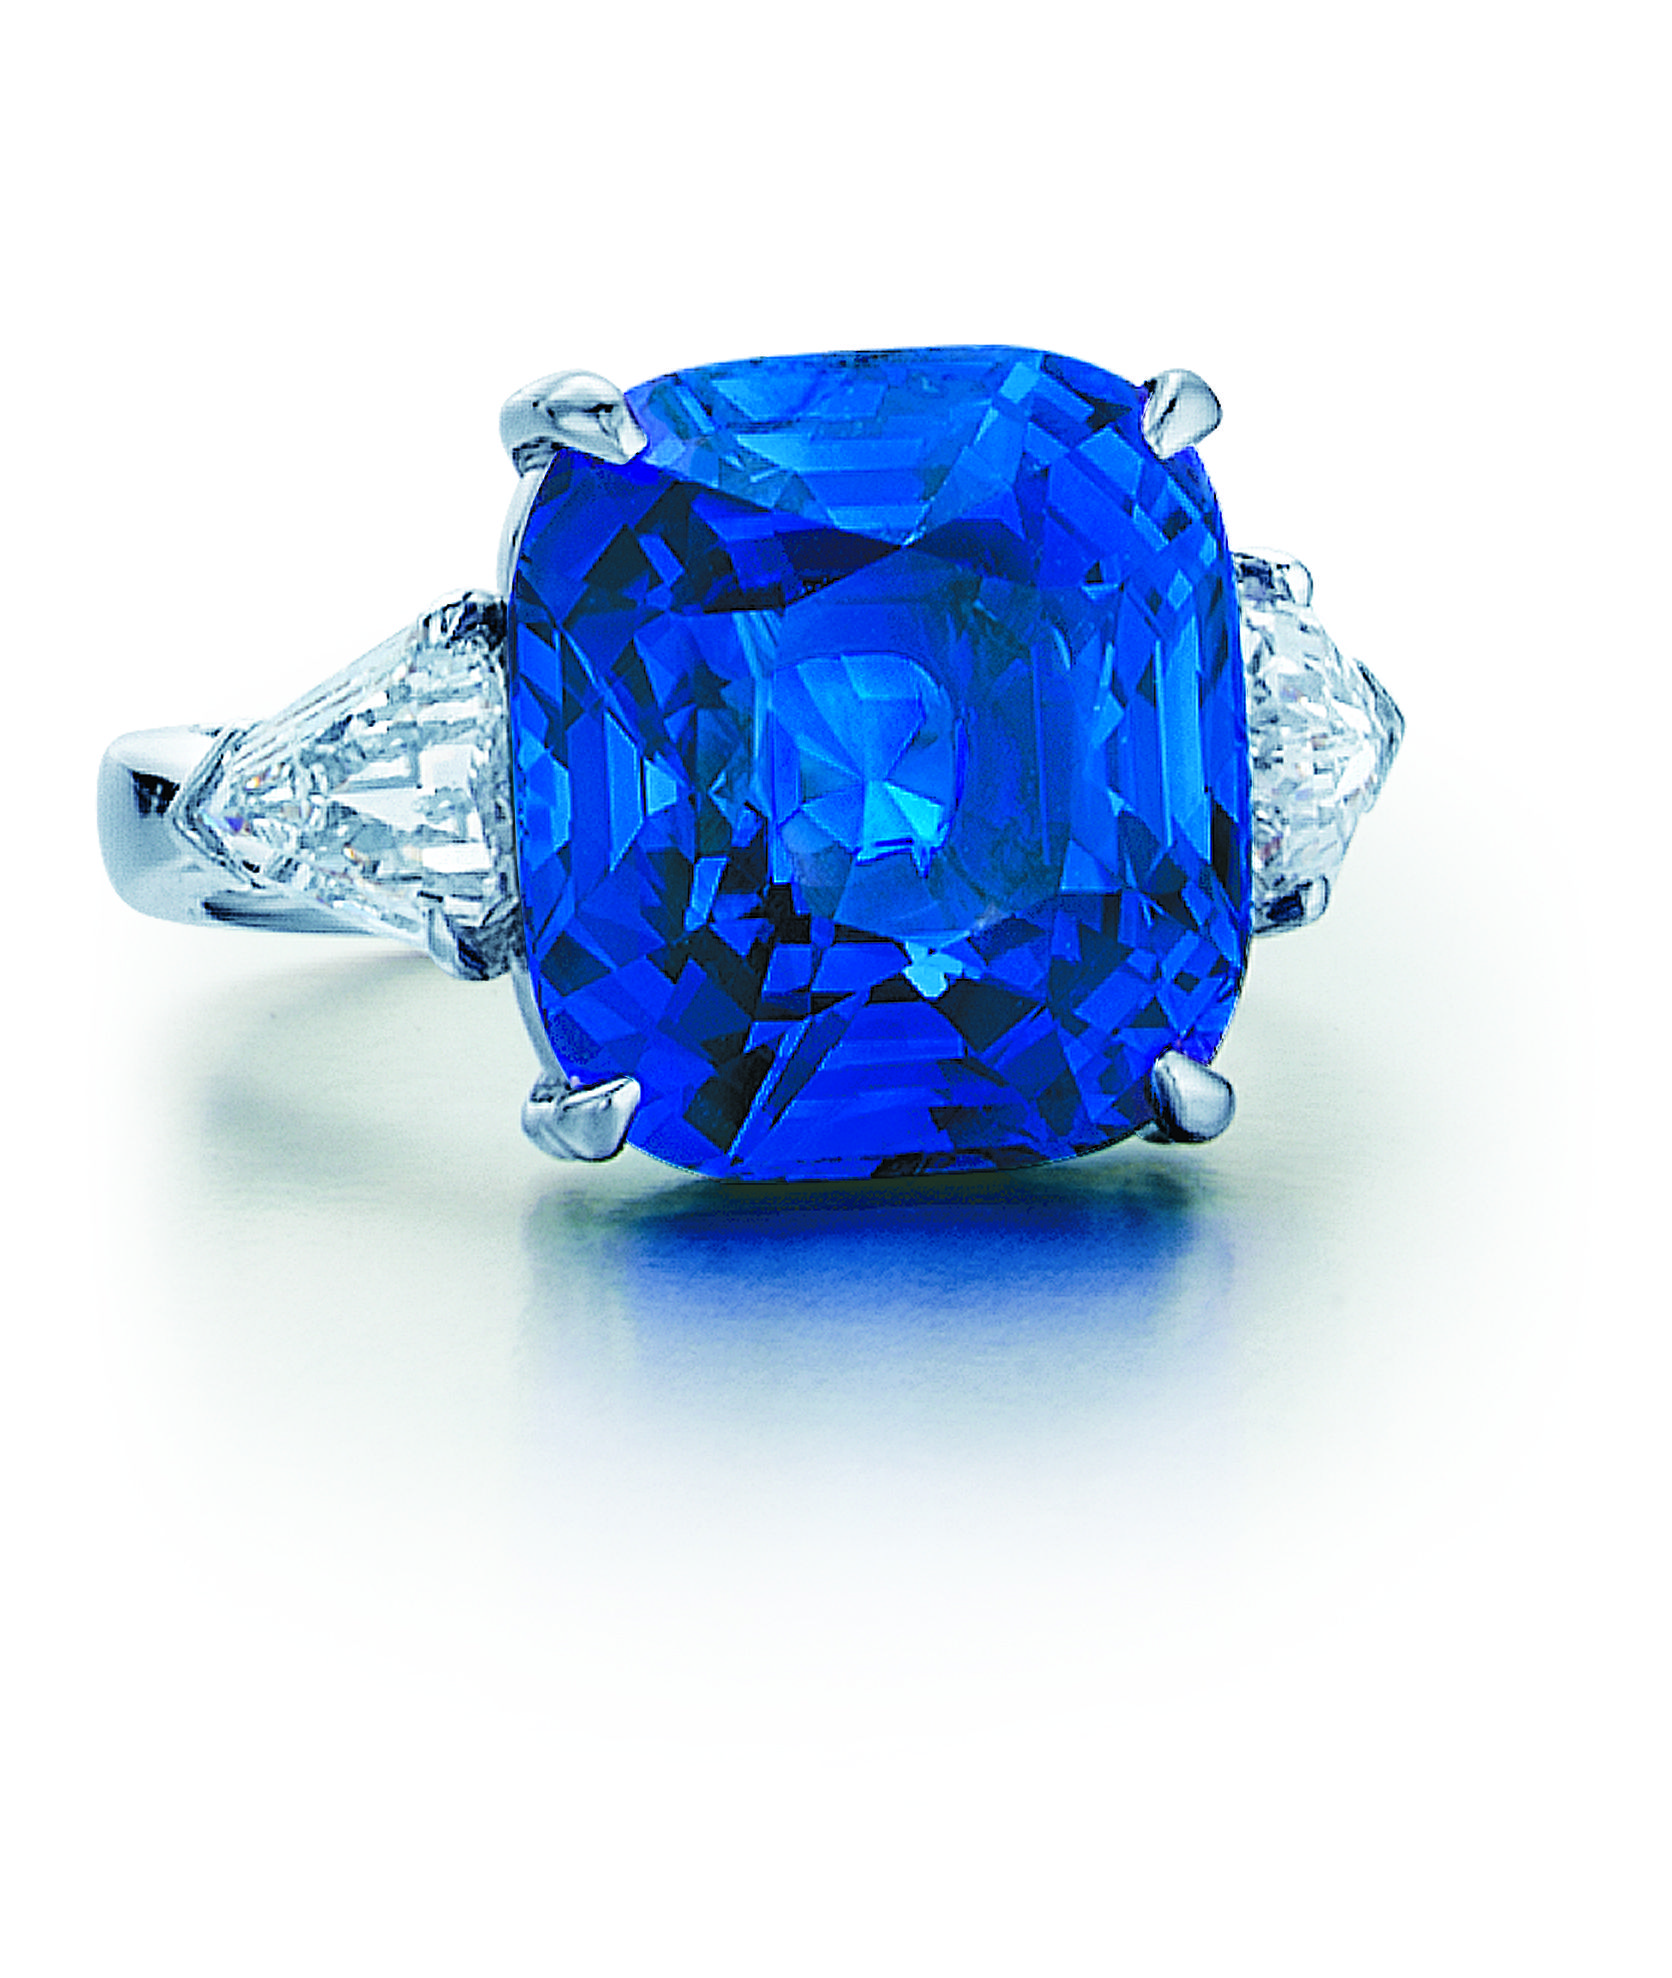 10 Alternative Engagement Rings Alternative Engagement Rings Jewelry Sapphire Jewelry